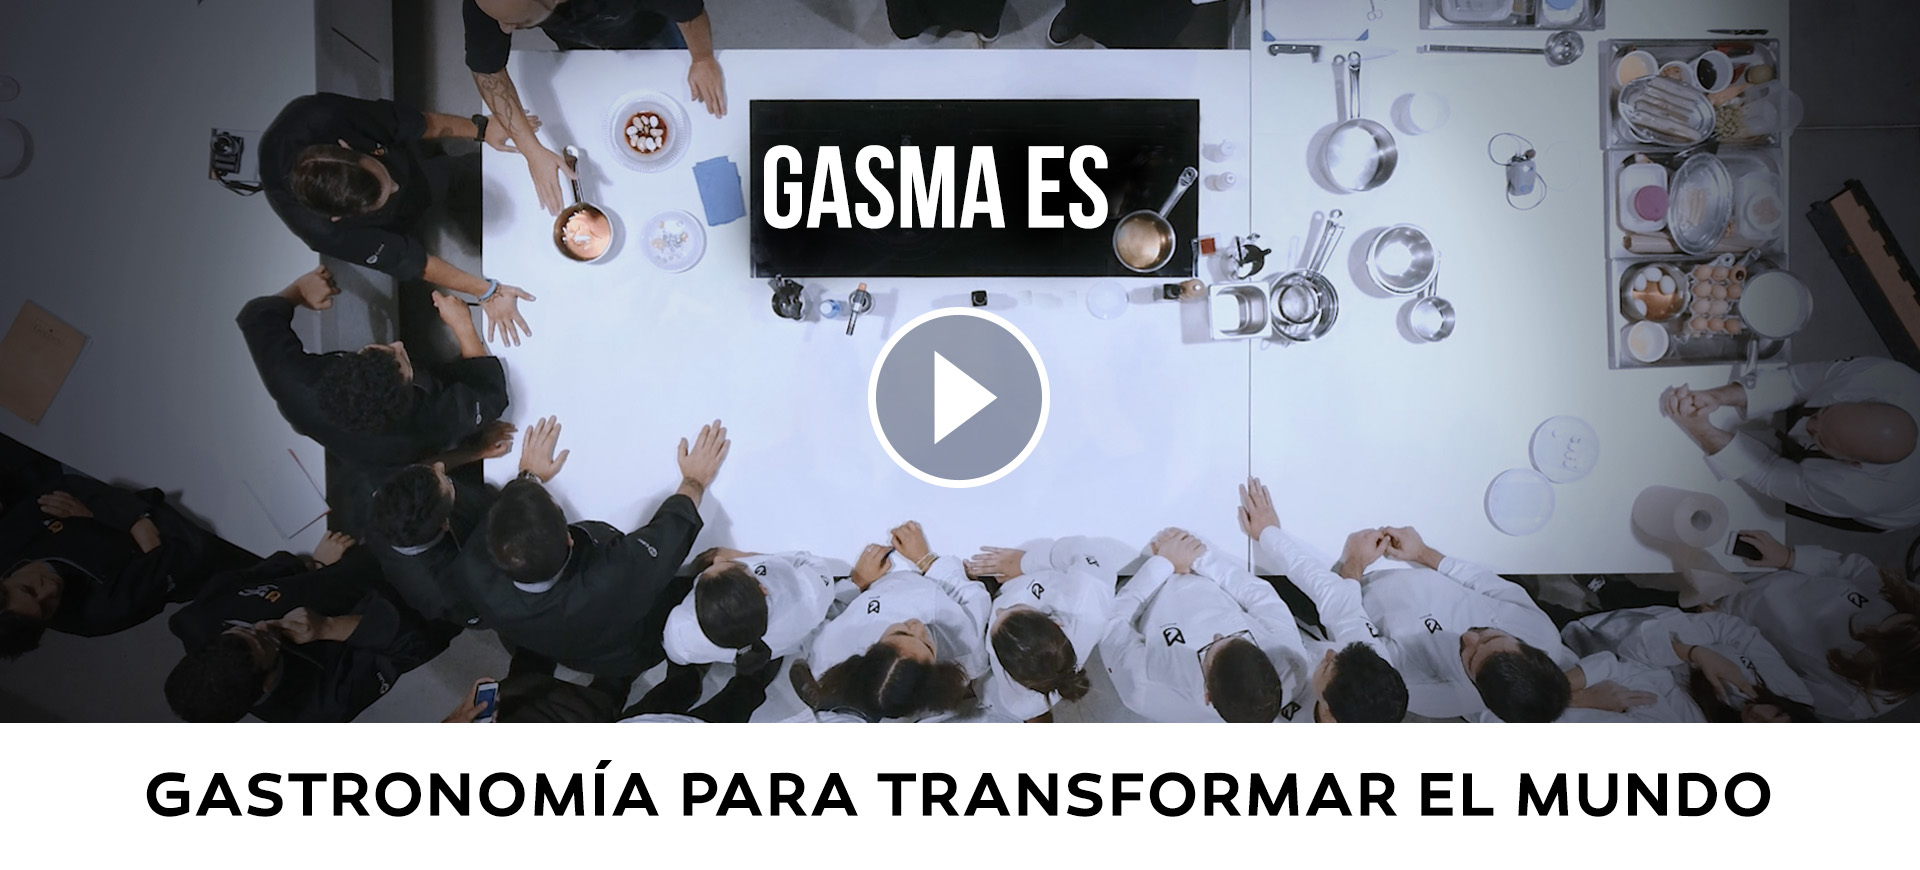 slide_gasmaes_blanco